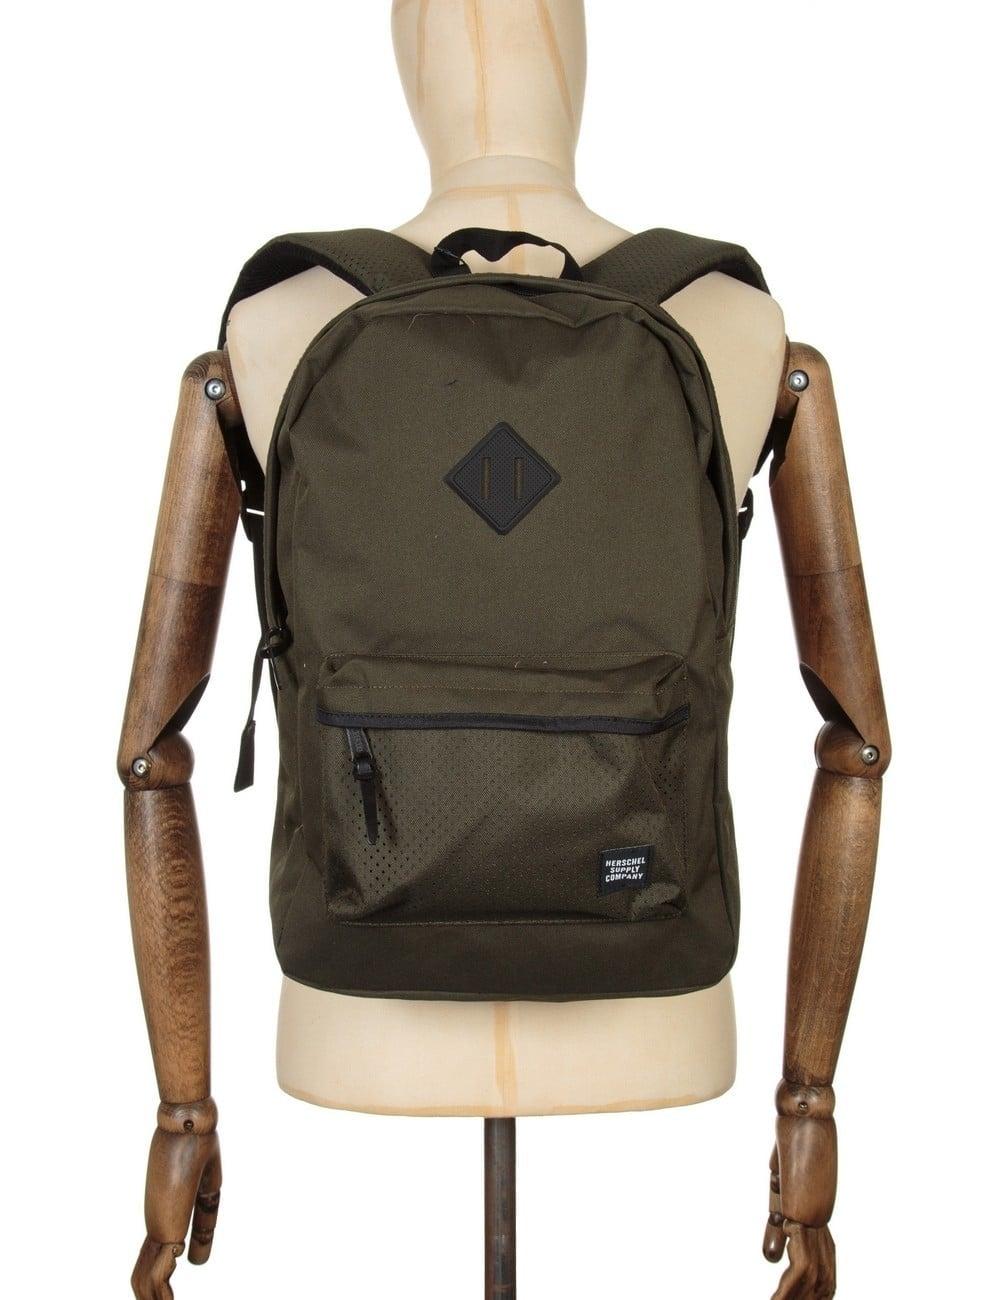 ba66461fdf60 Herschel Supply Co Heritage 21.5L Backpack - Forest Night Black Rubber